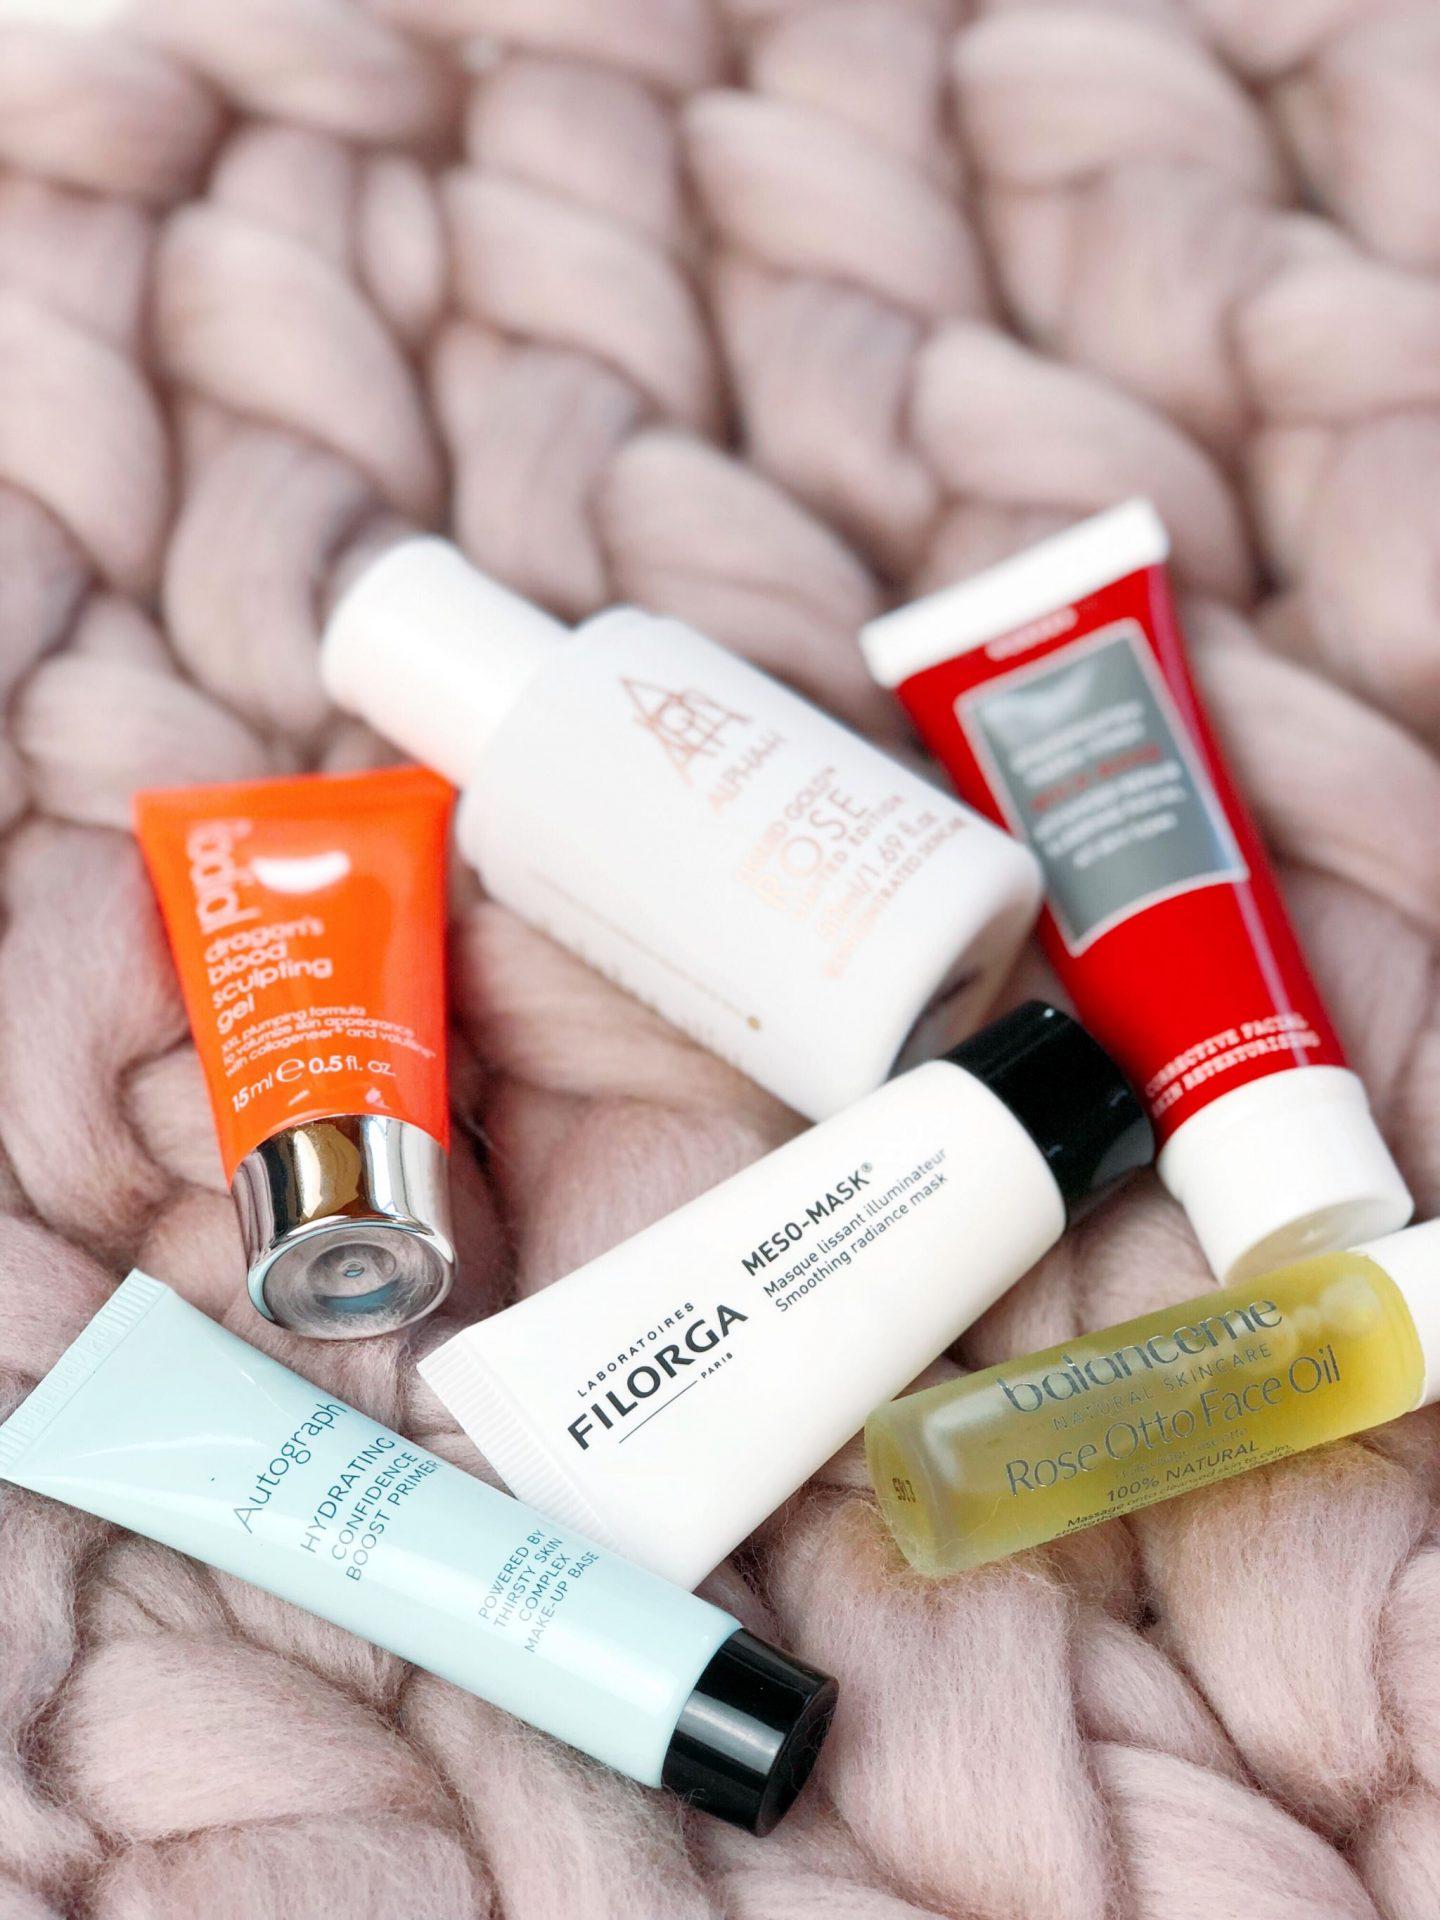 Testing New Skincare: 5 Speedy Reviews